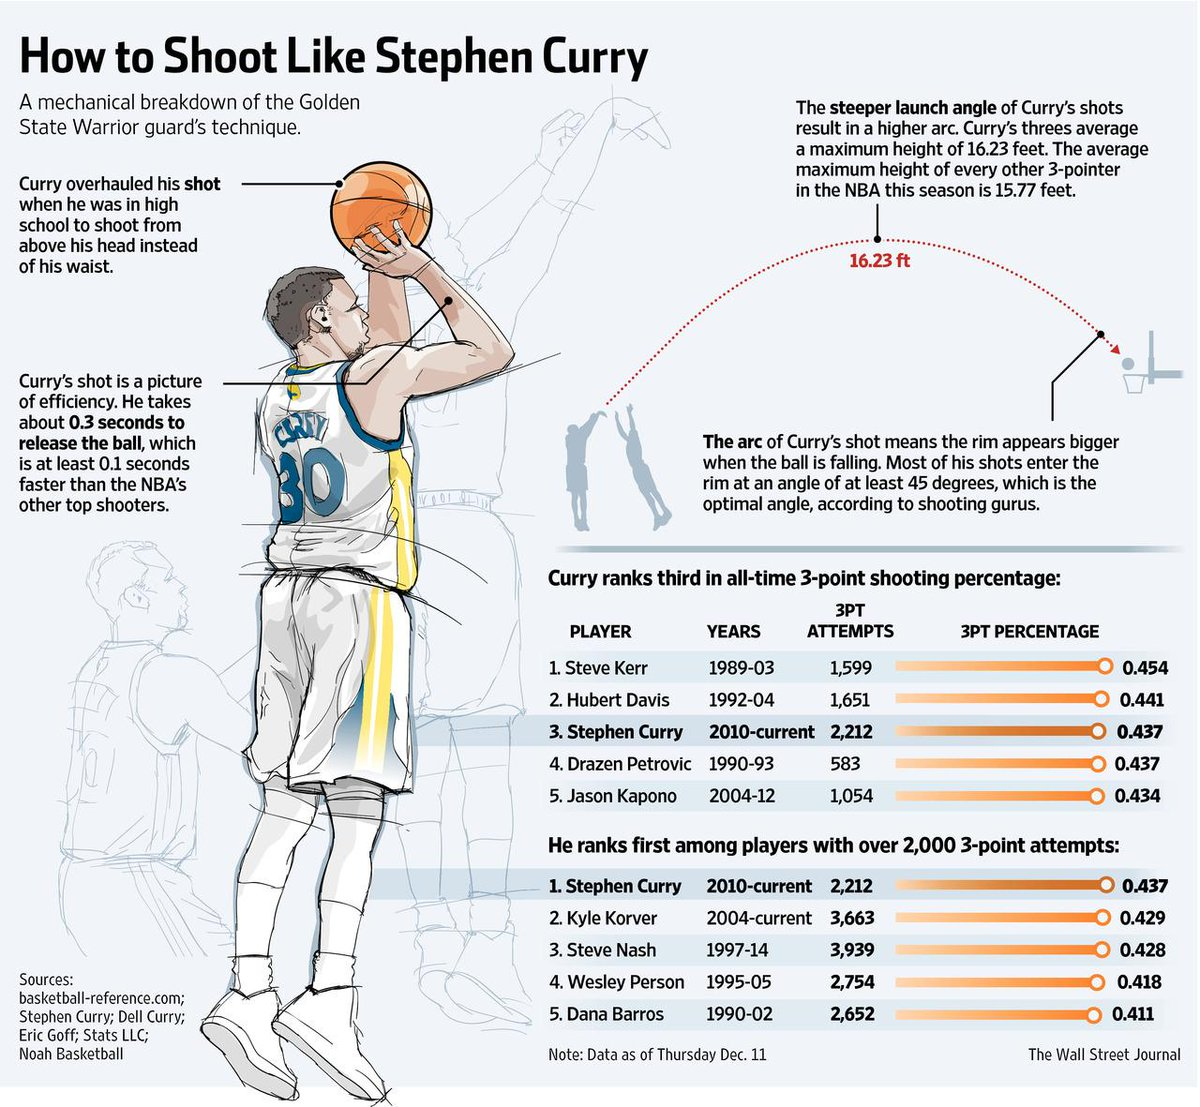 How do you shoot like Stephen Curry? http://t.co/Zgk2gWr9xB http://t.co/WVe4FYroFJ